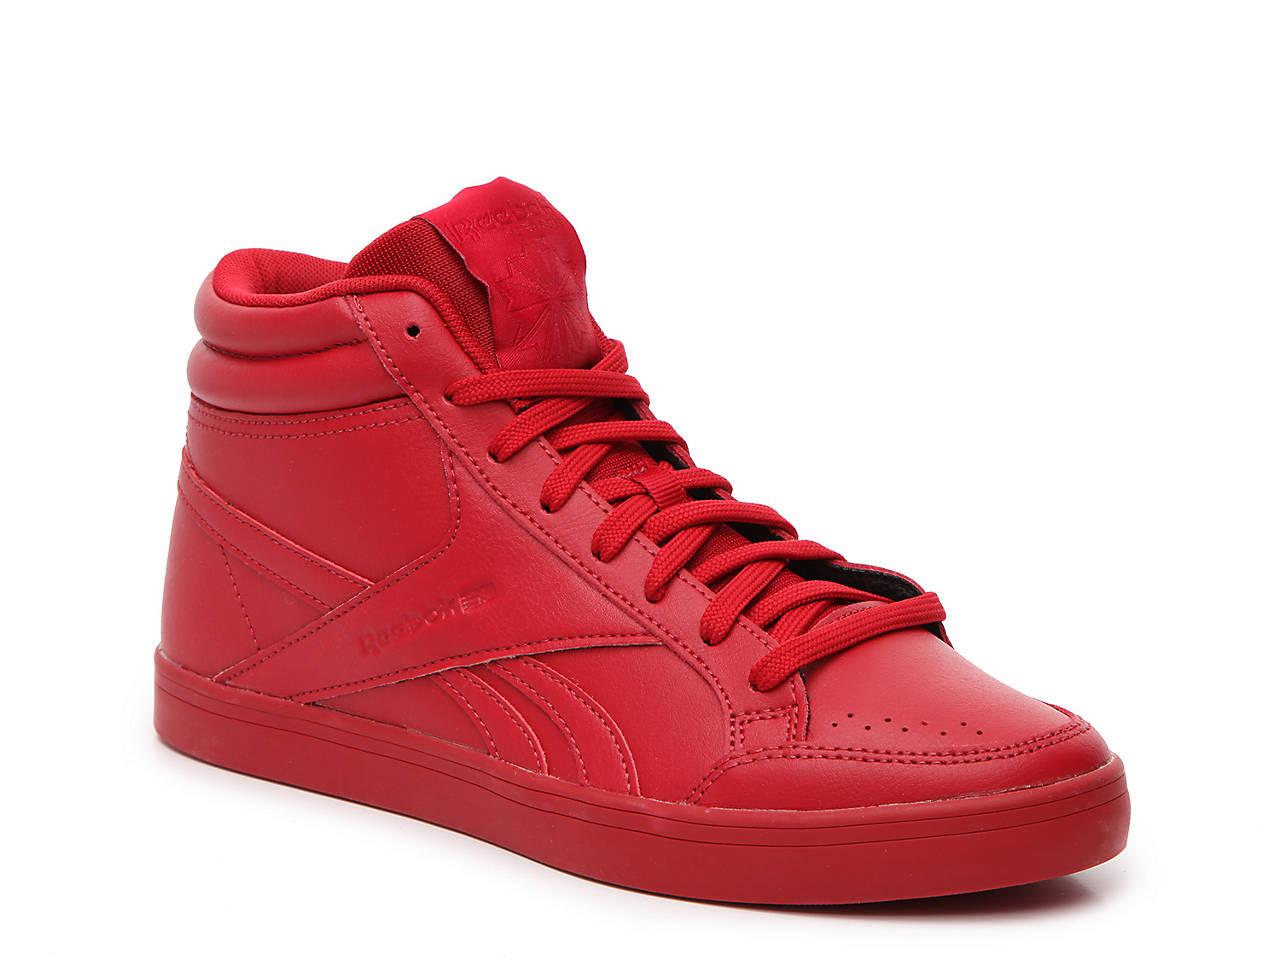 d4d384a890d2 Reebok Royal Aspire 2 Mid-Top Sneaker - Women s Women s Shoes